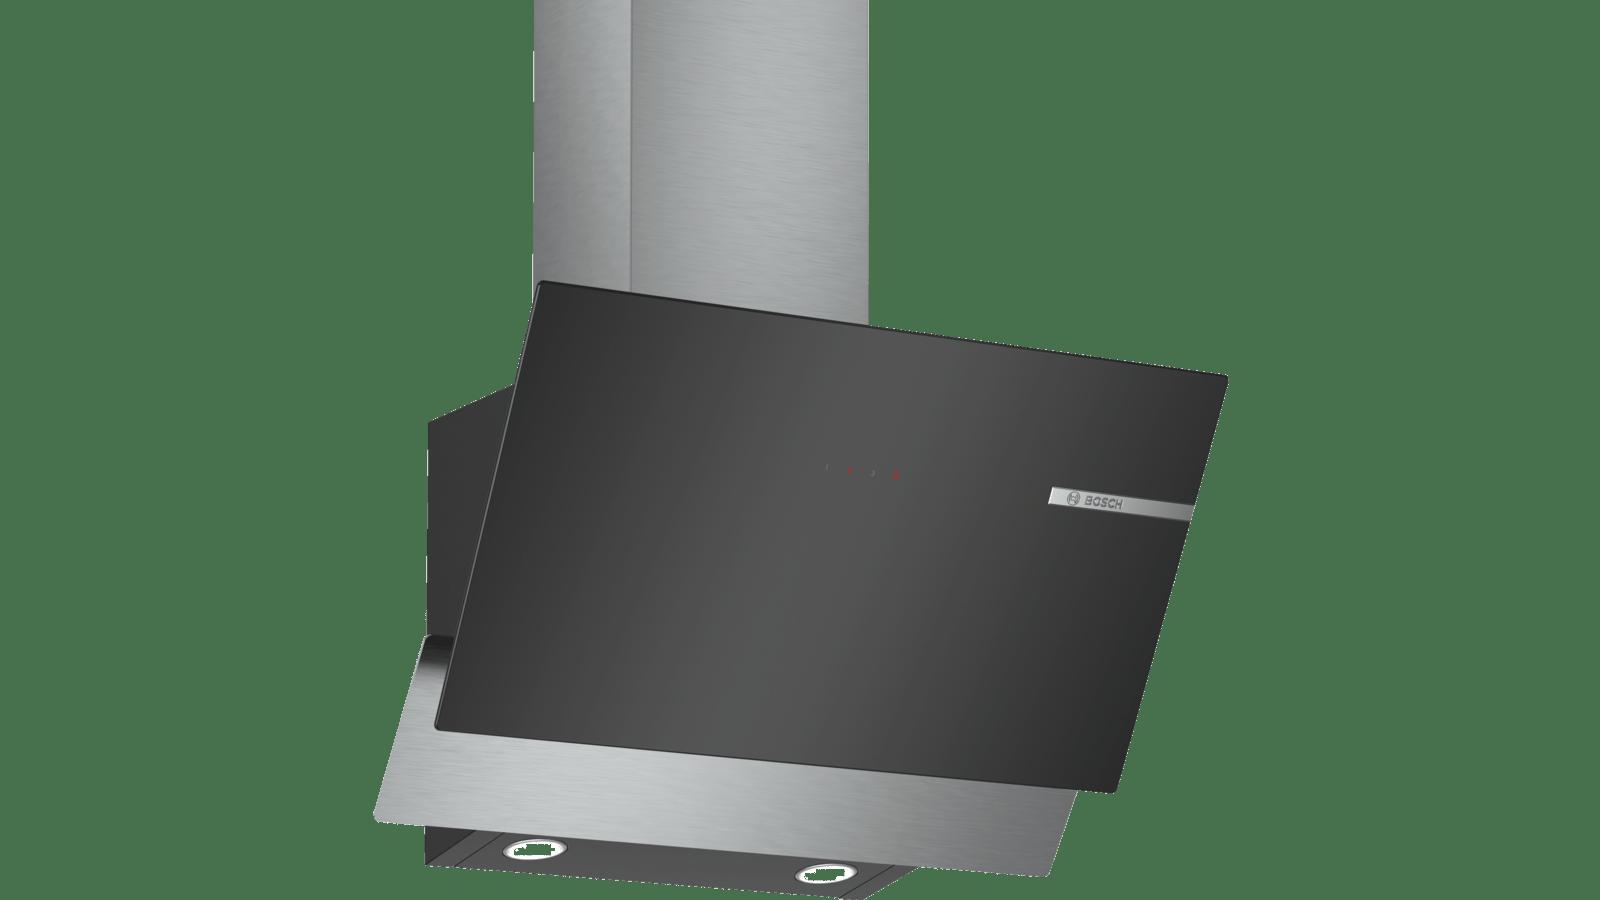 BOSCH - DWK65AD60R - Duvar Tipi Davlumbaz